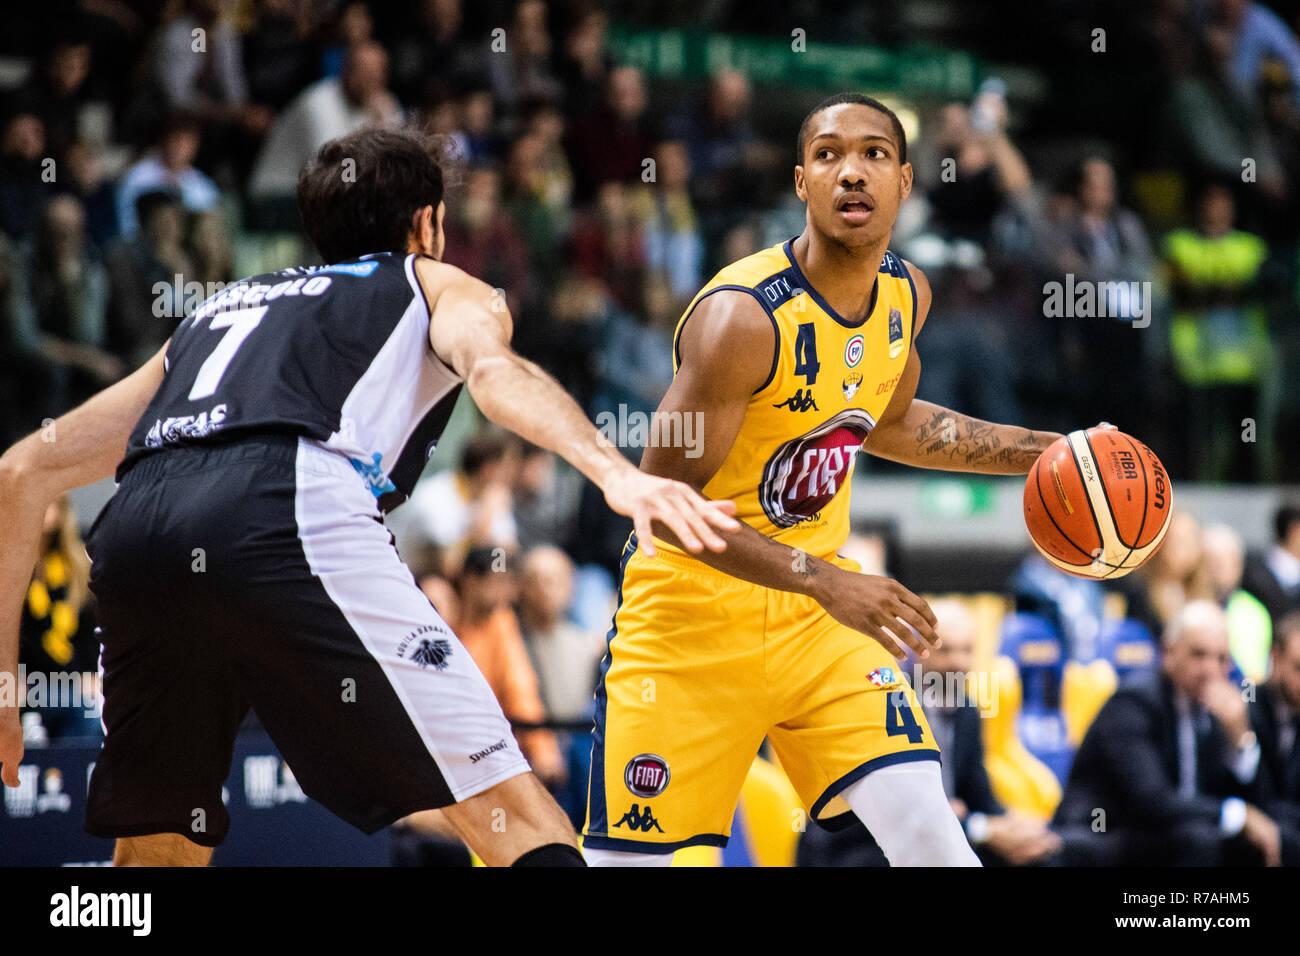 Foto LaPresse - Alberto Gandolfo 8-12-2018 Torino - Italia Sport  PallacanestroFiat Torino vs Aquila Basket TrentoLega Basket  Serie A 2018/2019 Nella foto: Carr Photo LaPresse - Alberto  Gandolfo 8-12–2018 Torino - Italy